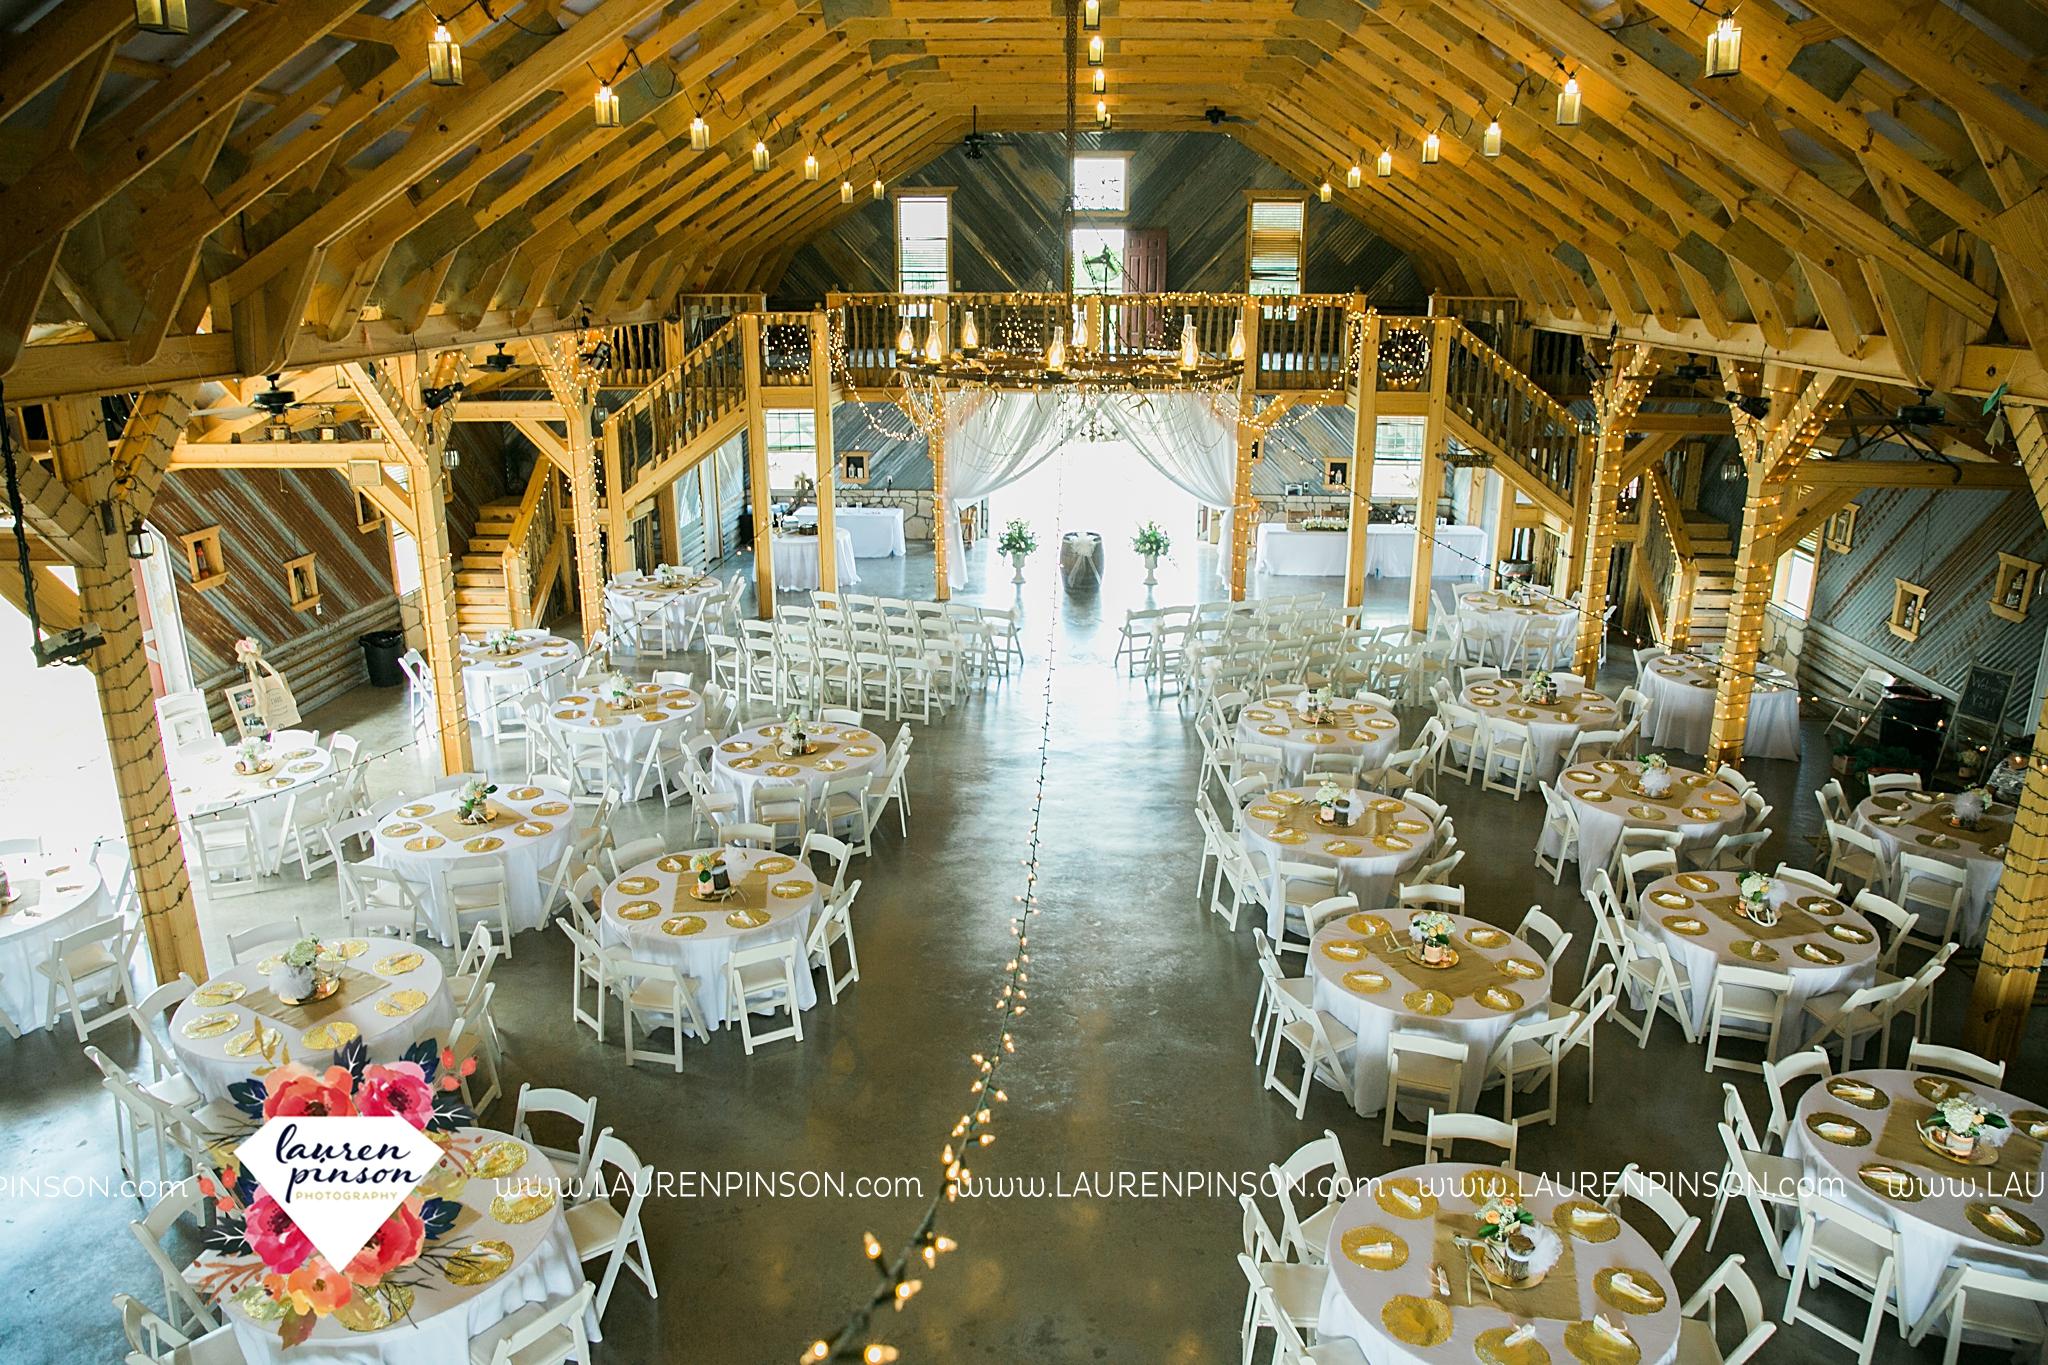 jones-barn-willow-creek-ranch-wedding-in-cleburne-texas-fort-worth-dfw-wichita-falls-wedding-photography_3233.jpg